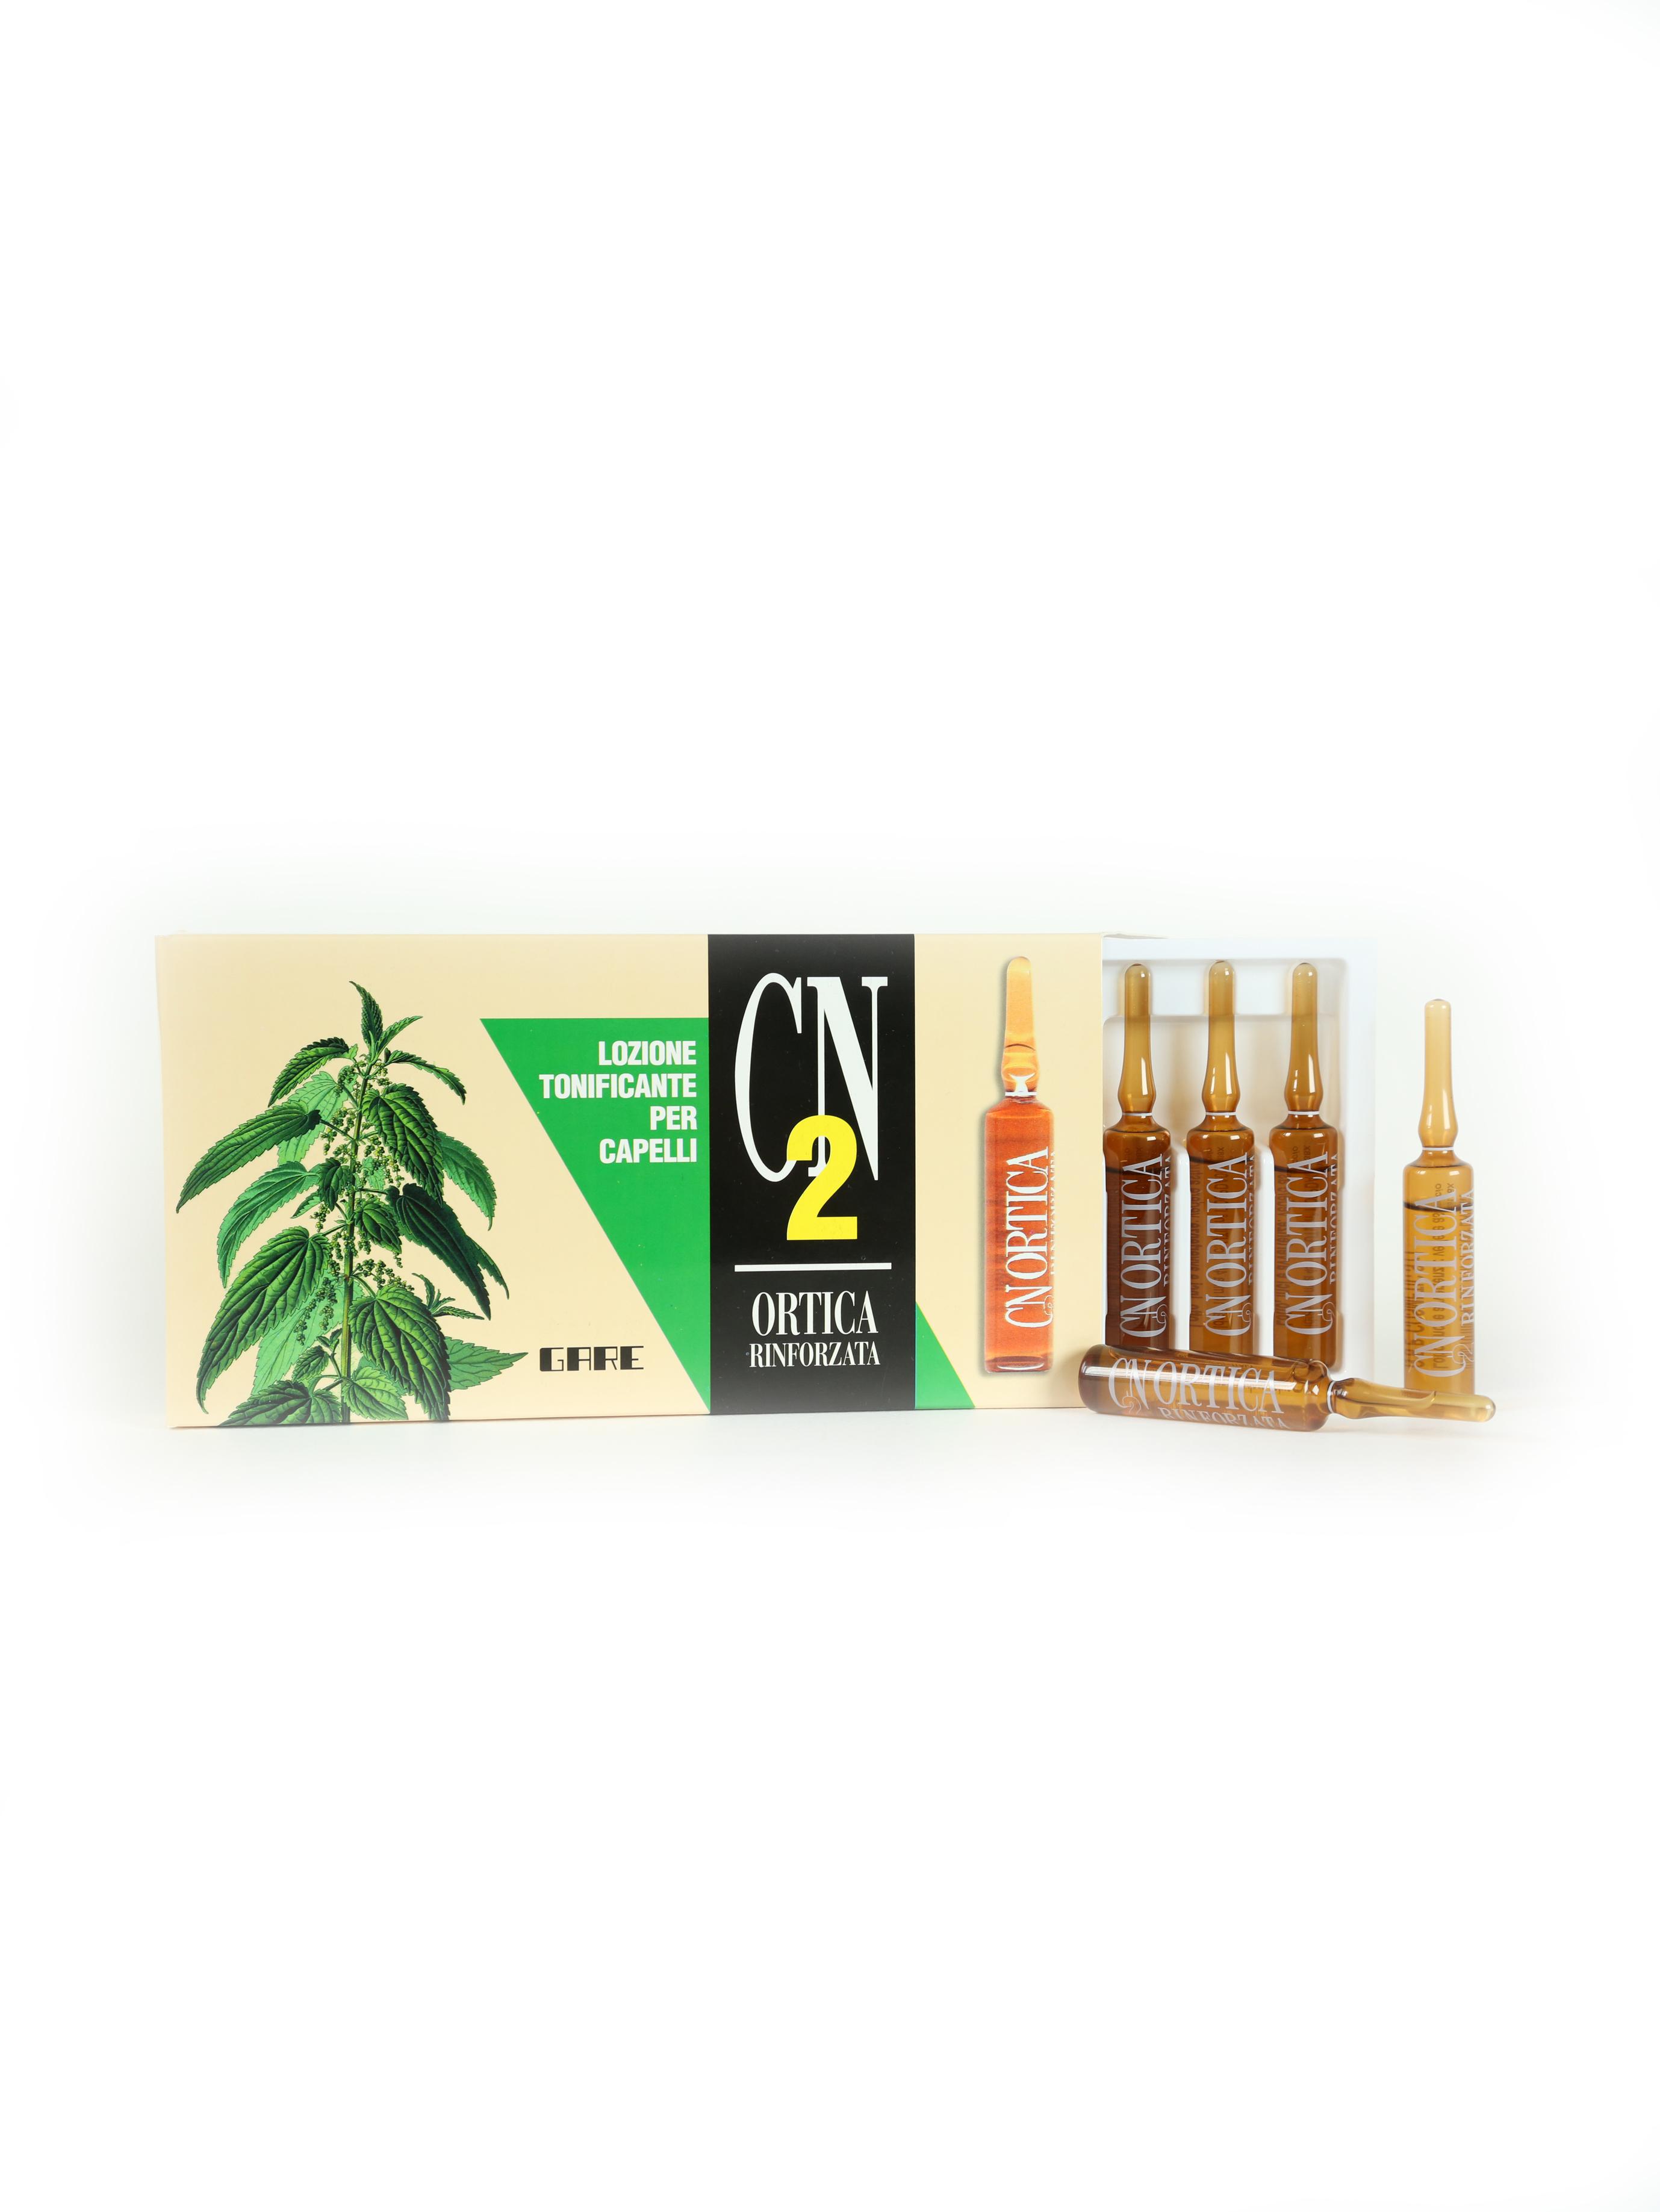 Тонизирующий лосьон в ампулах для волос DRNA